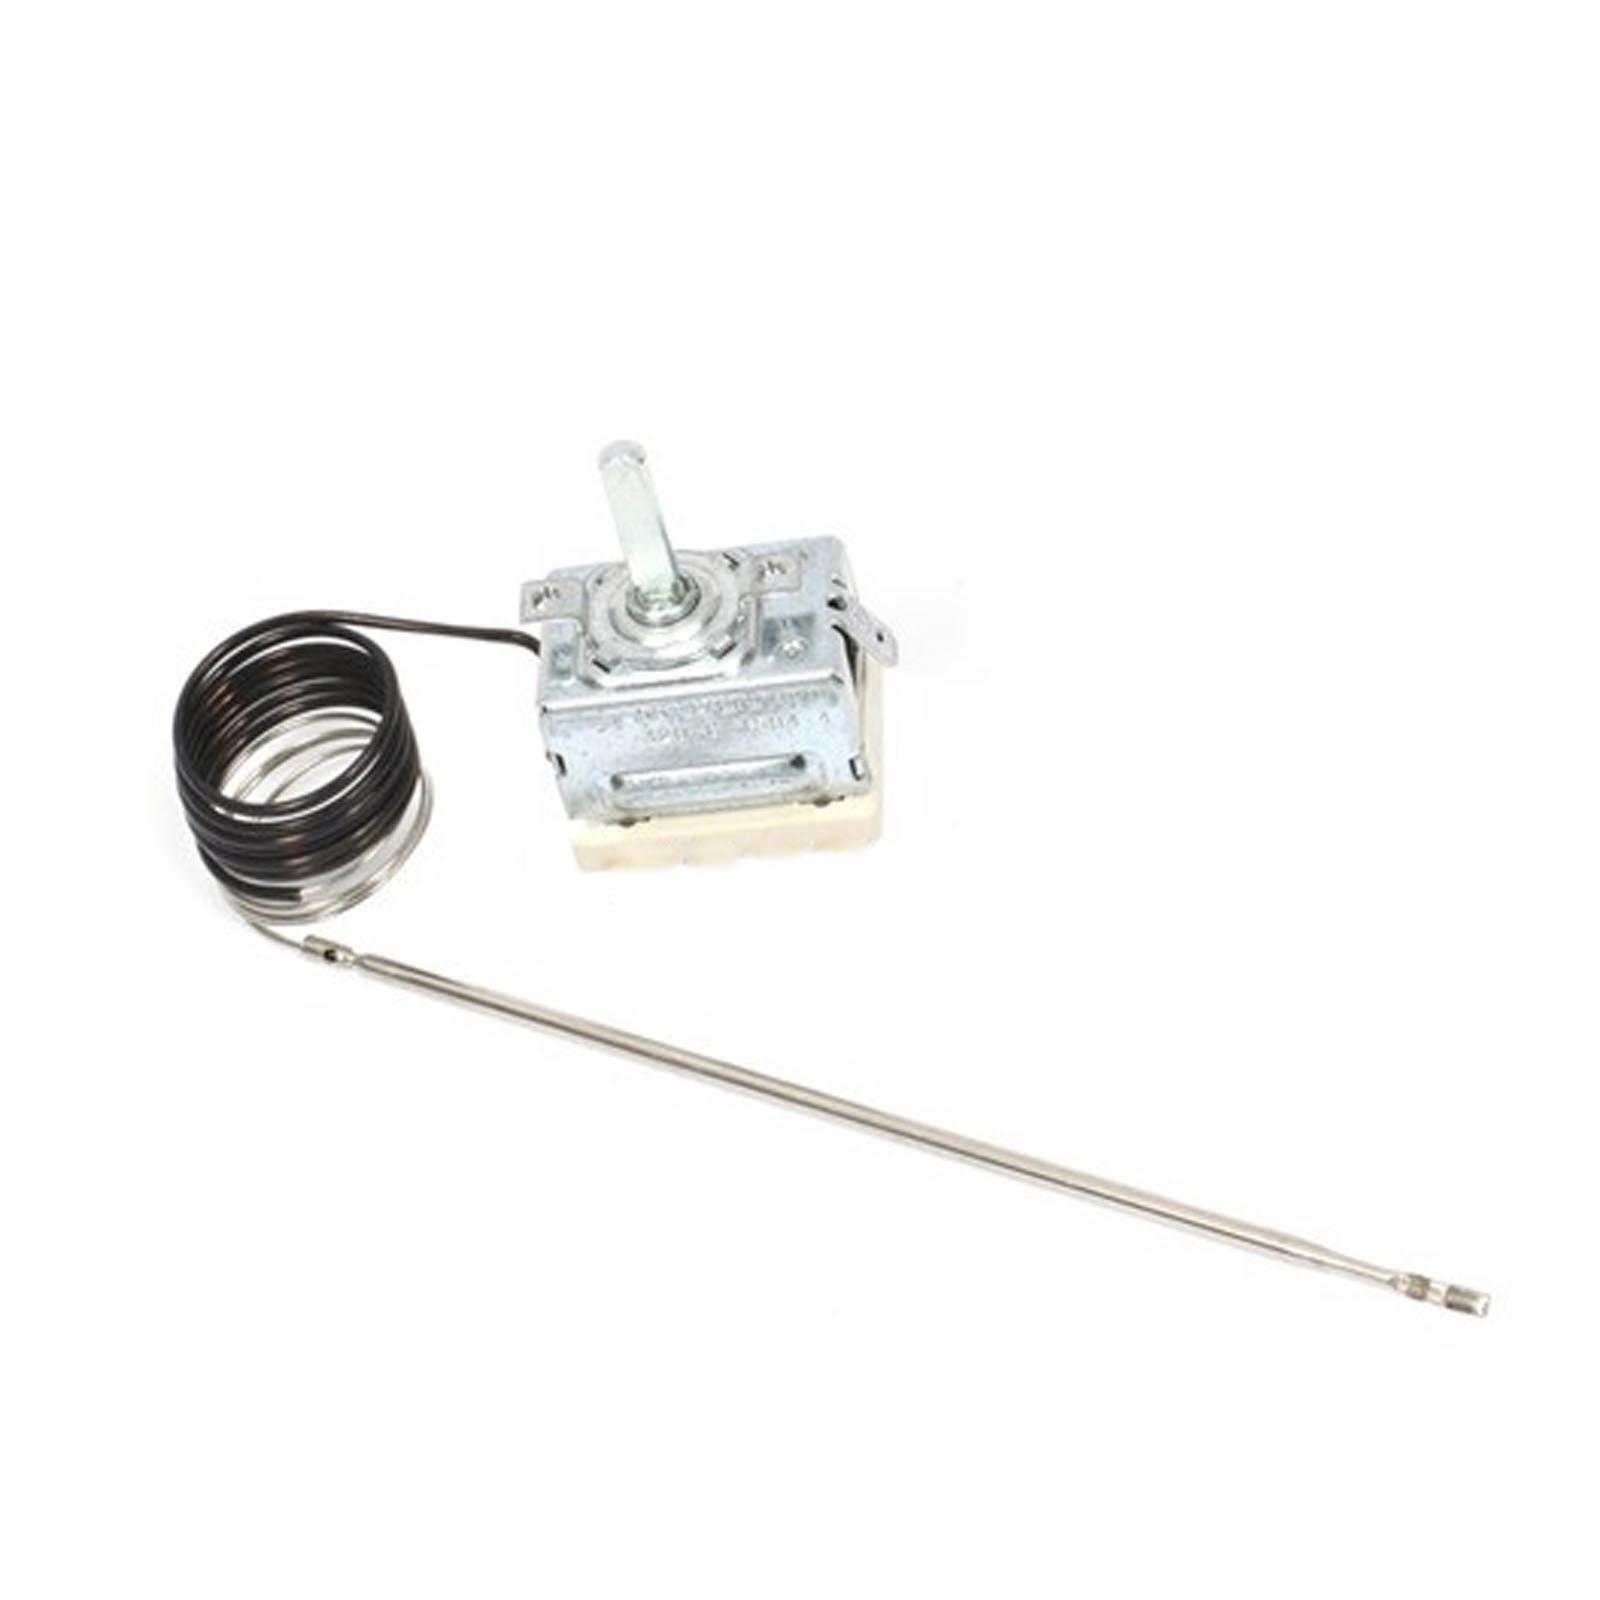 Genuine Beko Cooker Thermostat EGO TEMP 250C EGO 55.17042